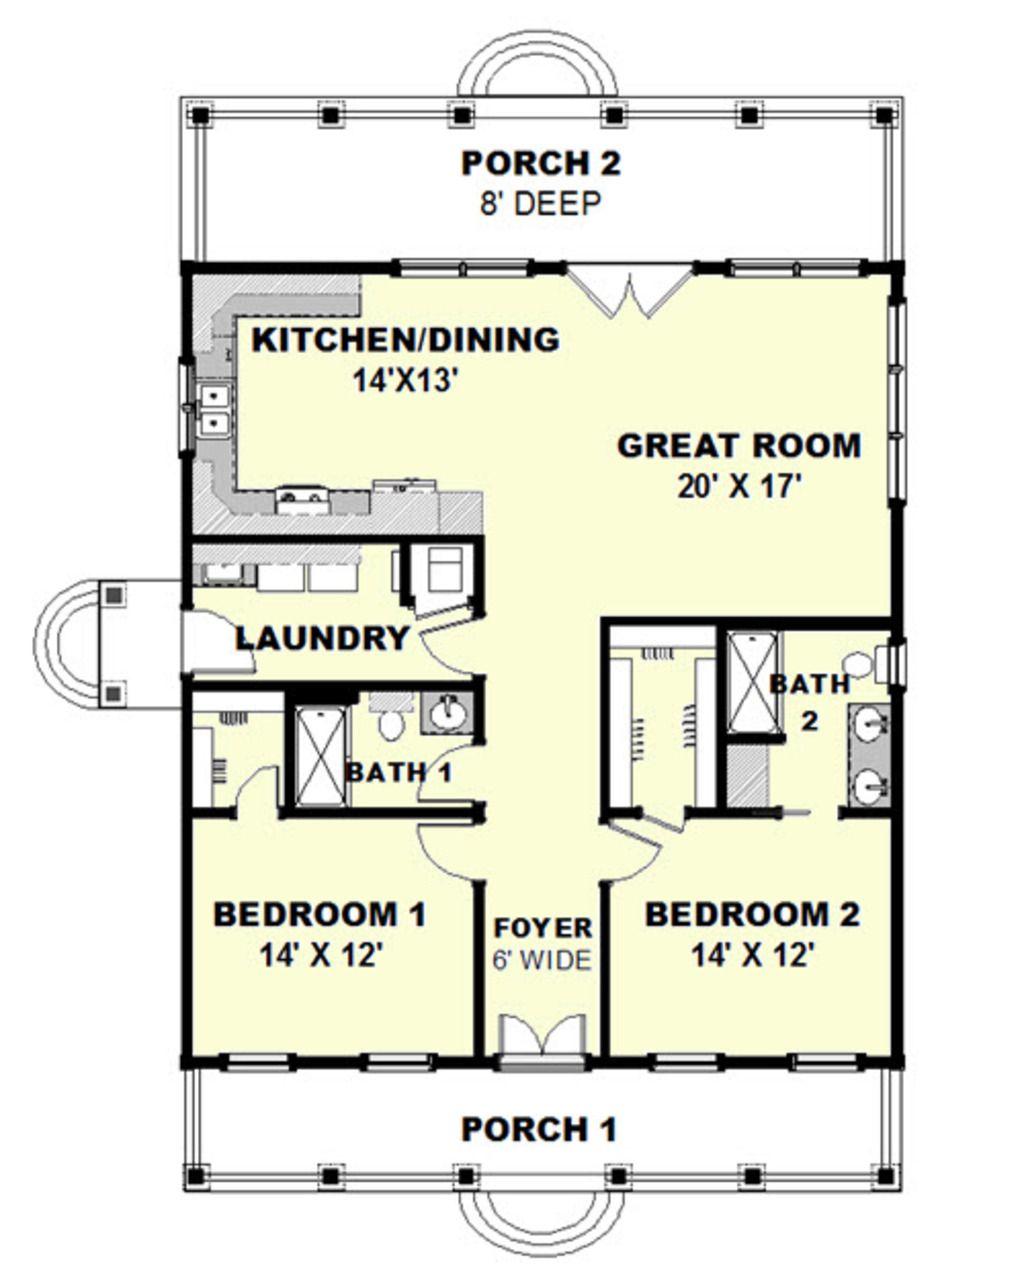 Cottage Style House Plan 2 Beds 2 Baths 1292 Sq Ft Plan 44 165 Cottage Style House Plans Country Style House Plans House Blueprints